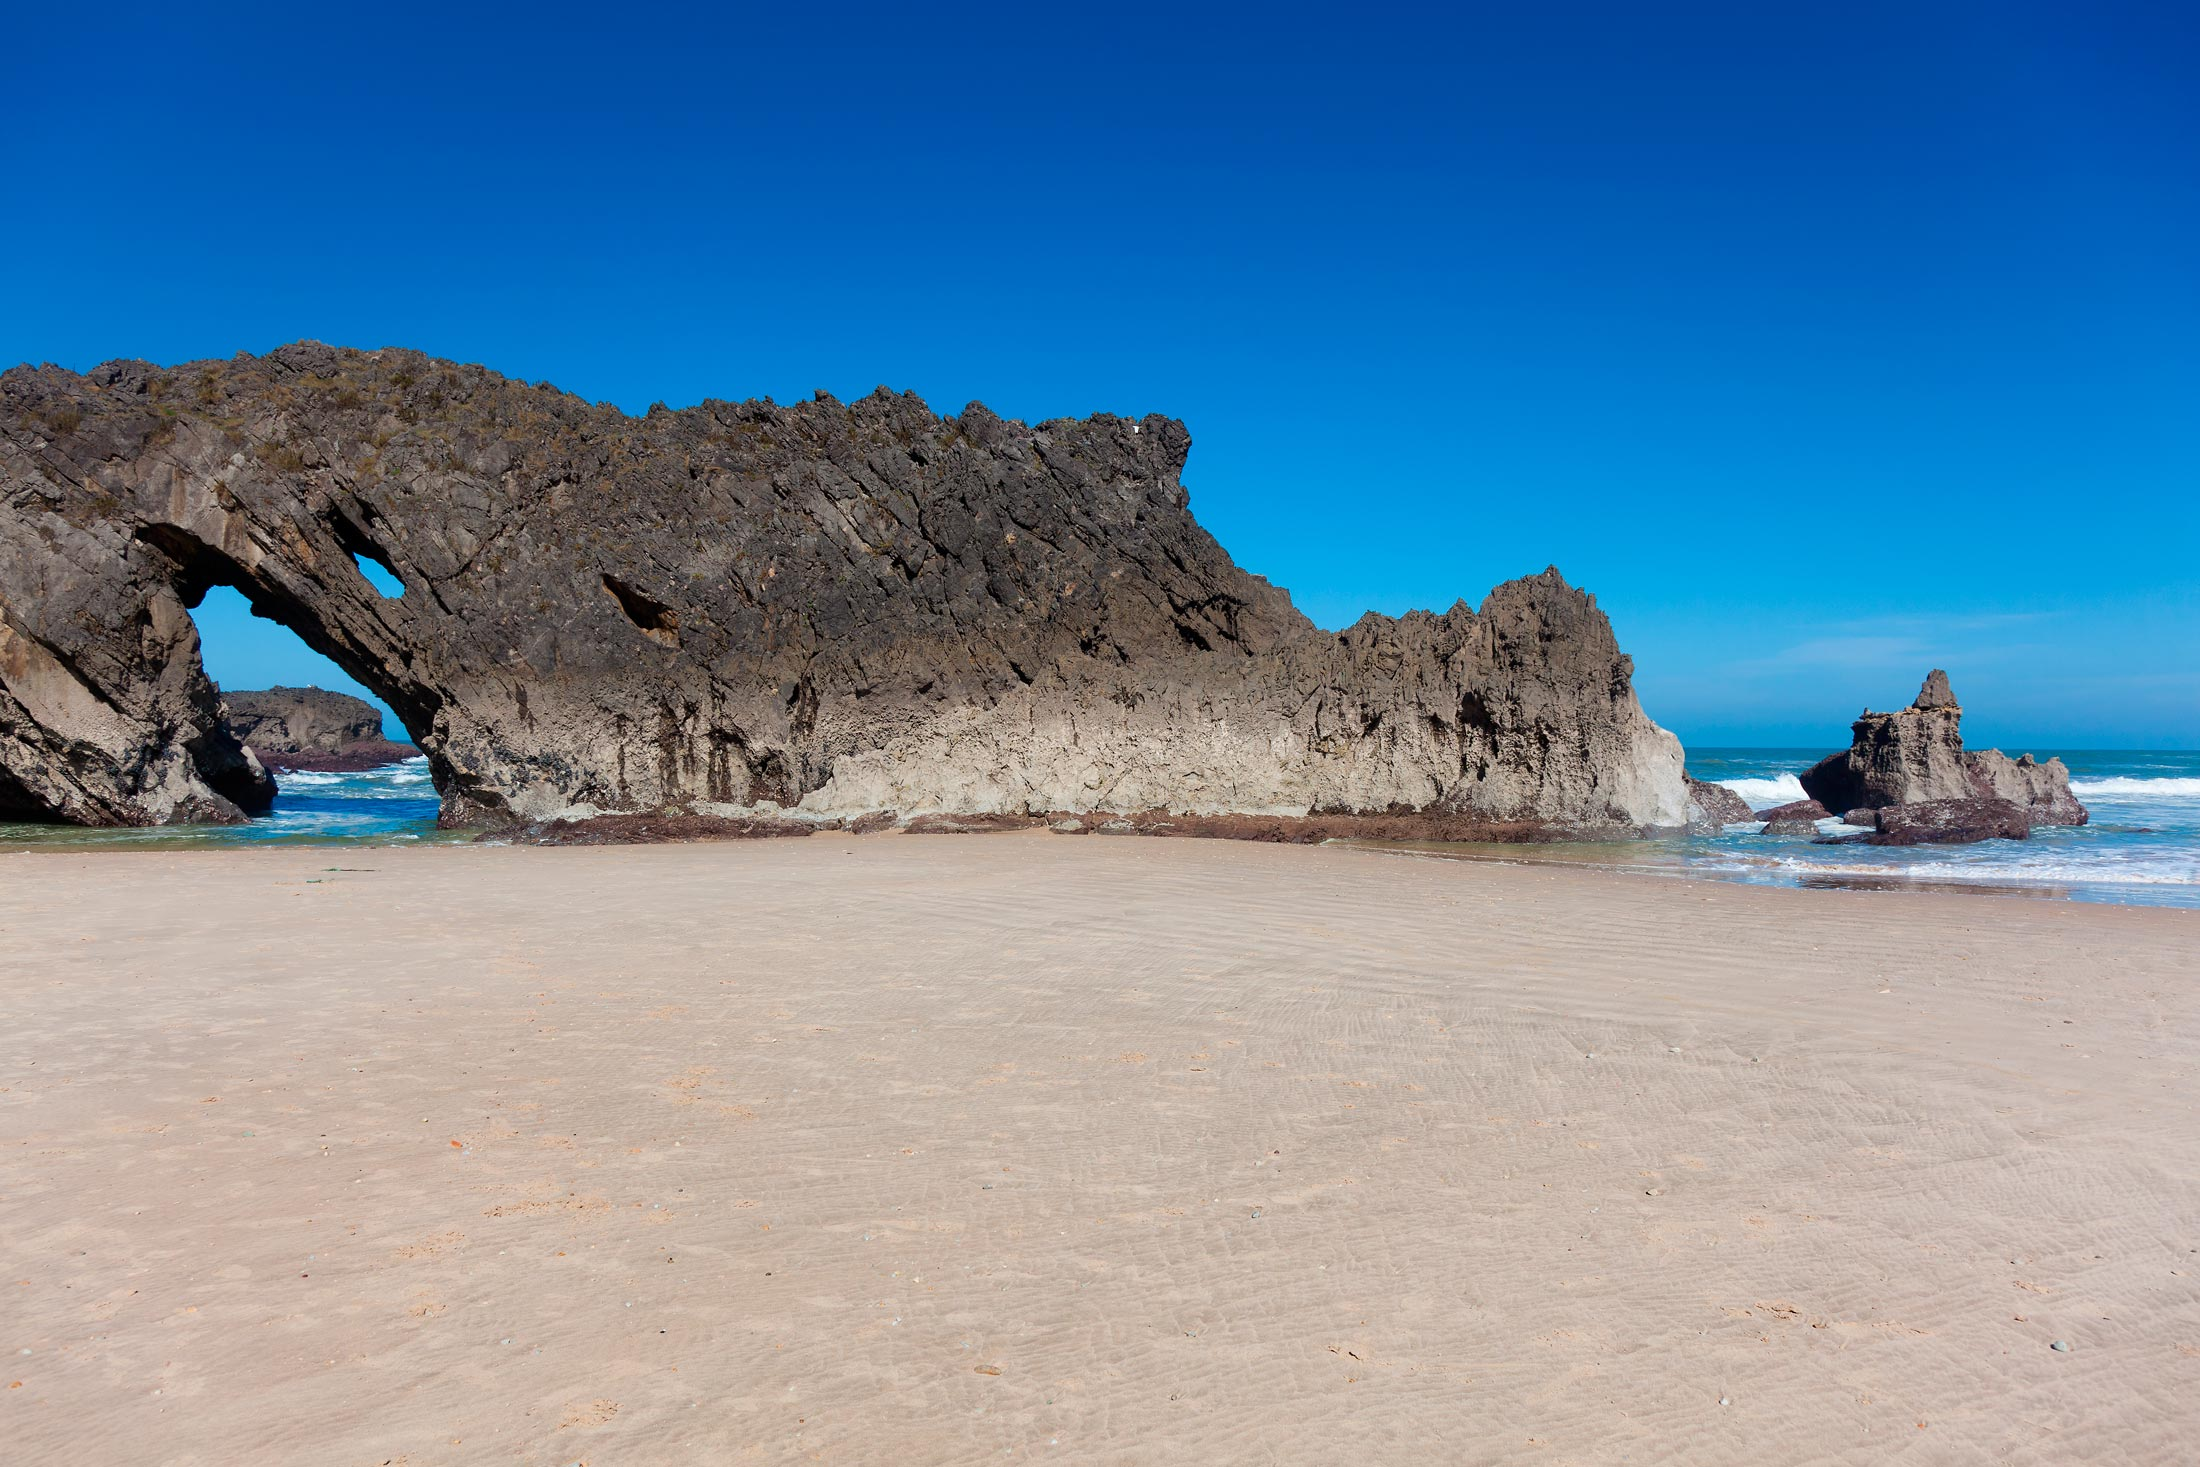 La playa de San Antolín. Asturias